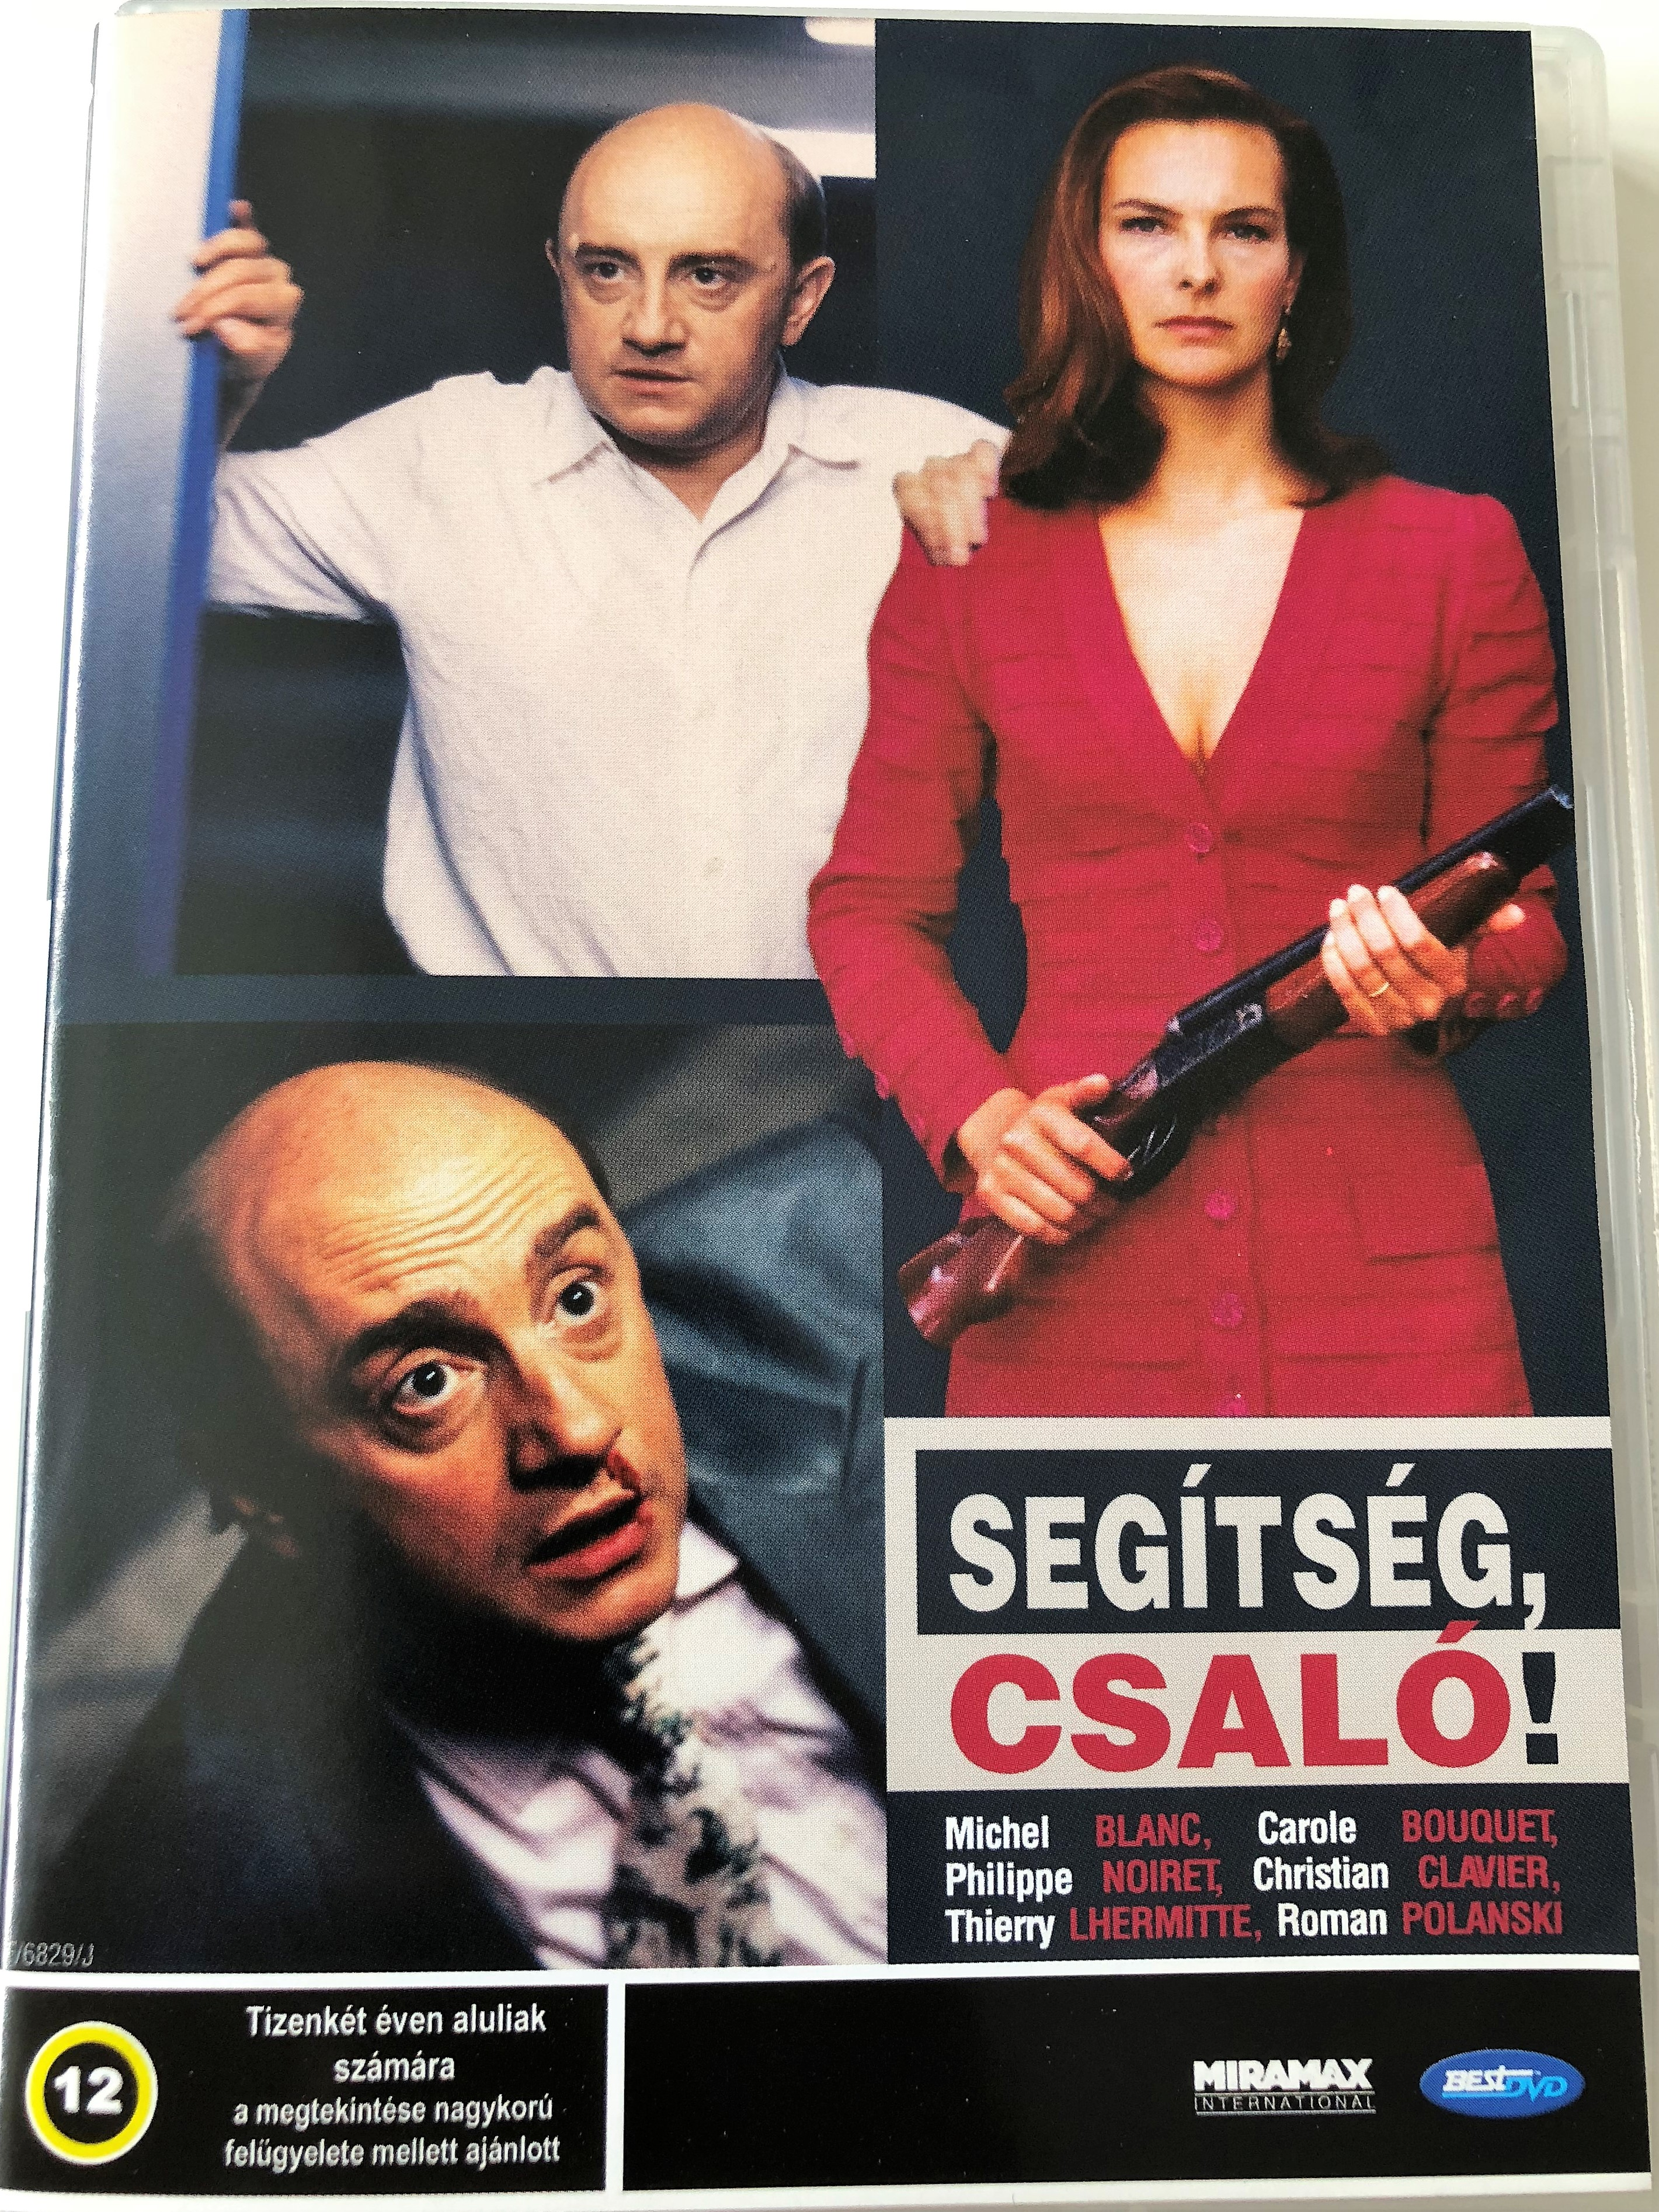 gross-fatigue-dead-tired-dvd-1993-seg-ts-g-csal-directed-by-michel-blanc-starring-michel-blanc-carole-bouquet-1-.jpg